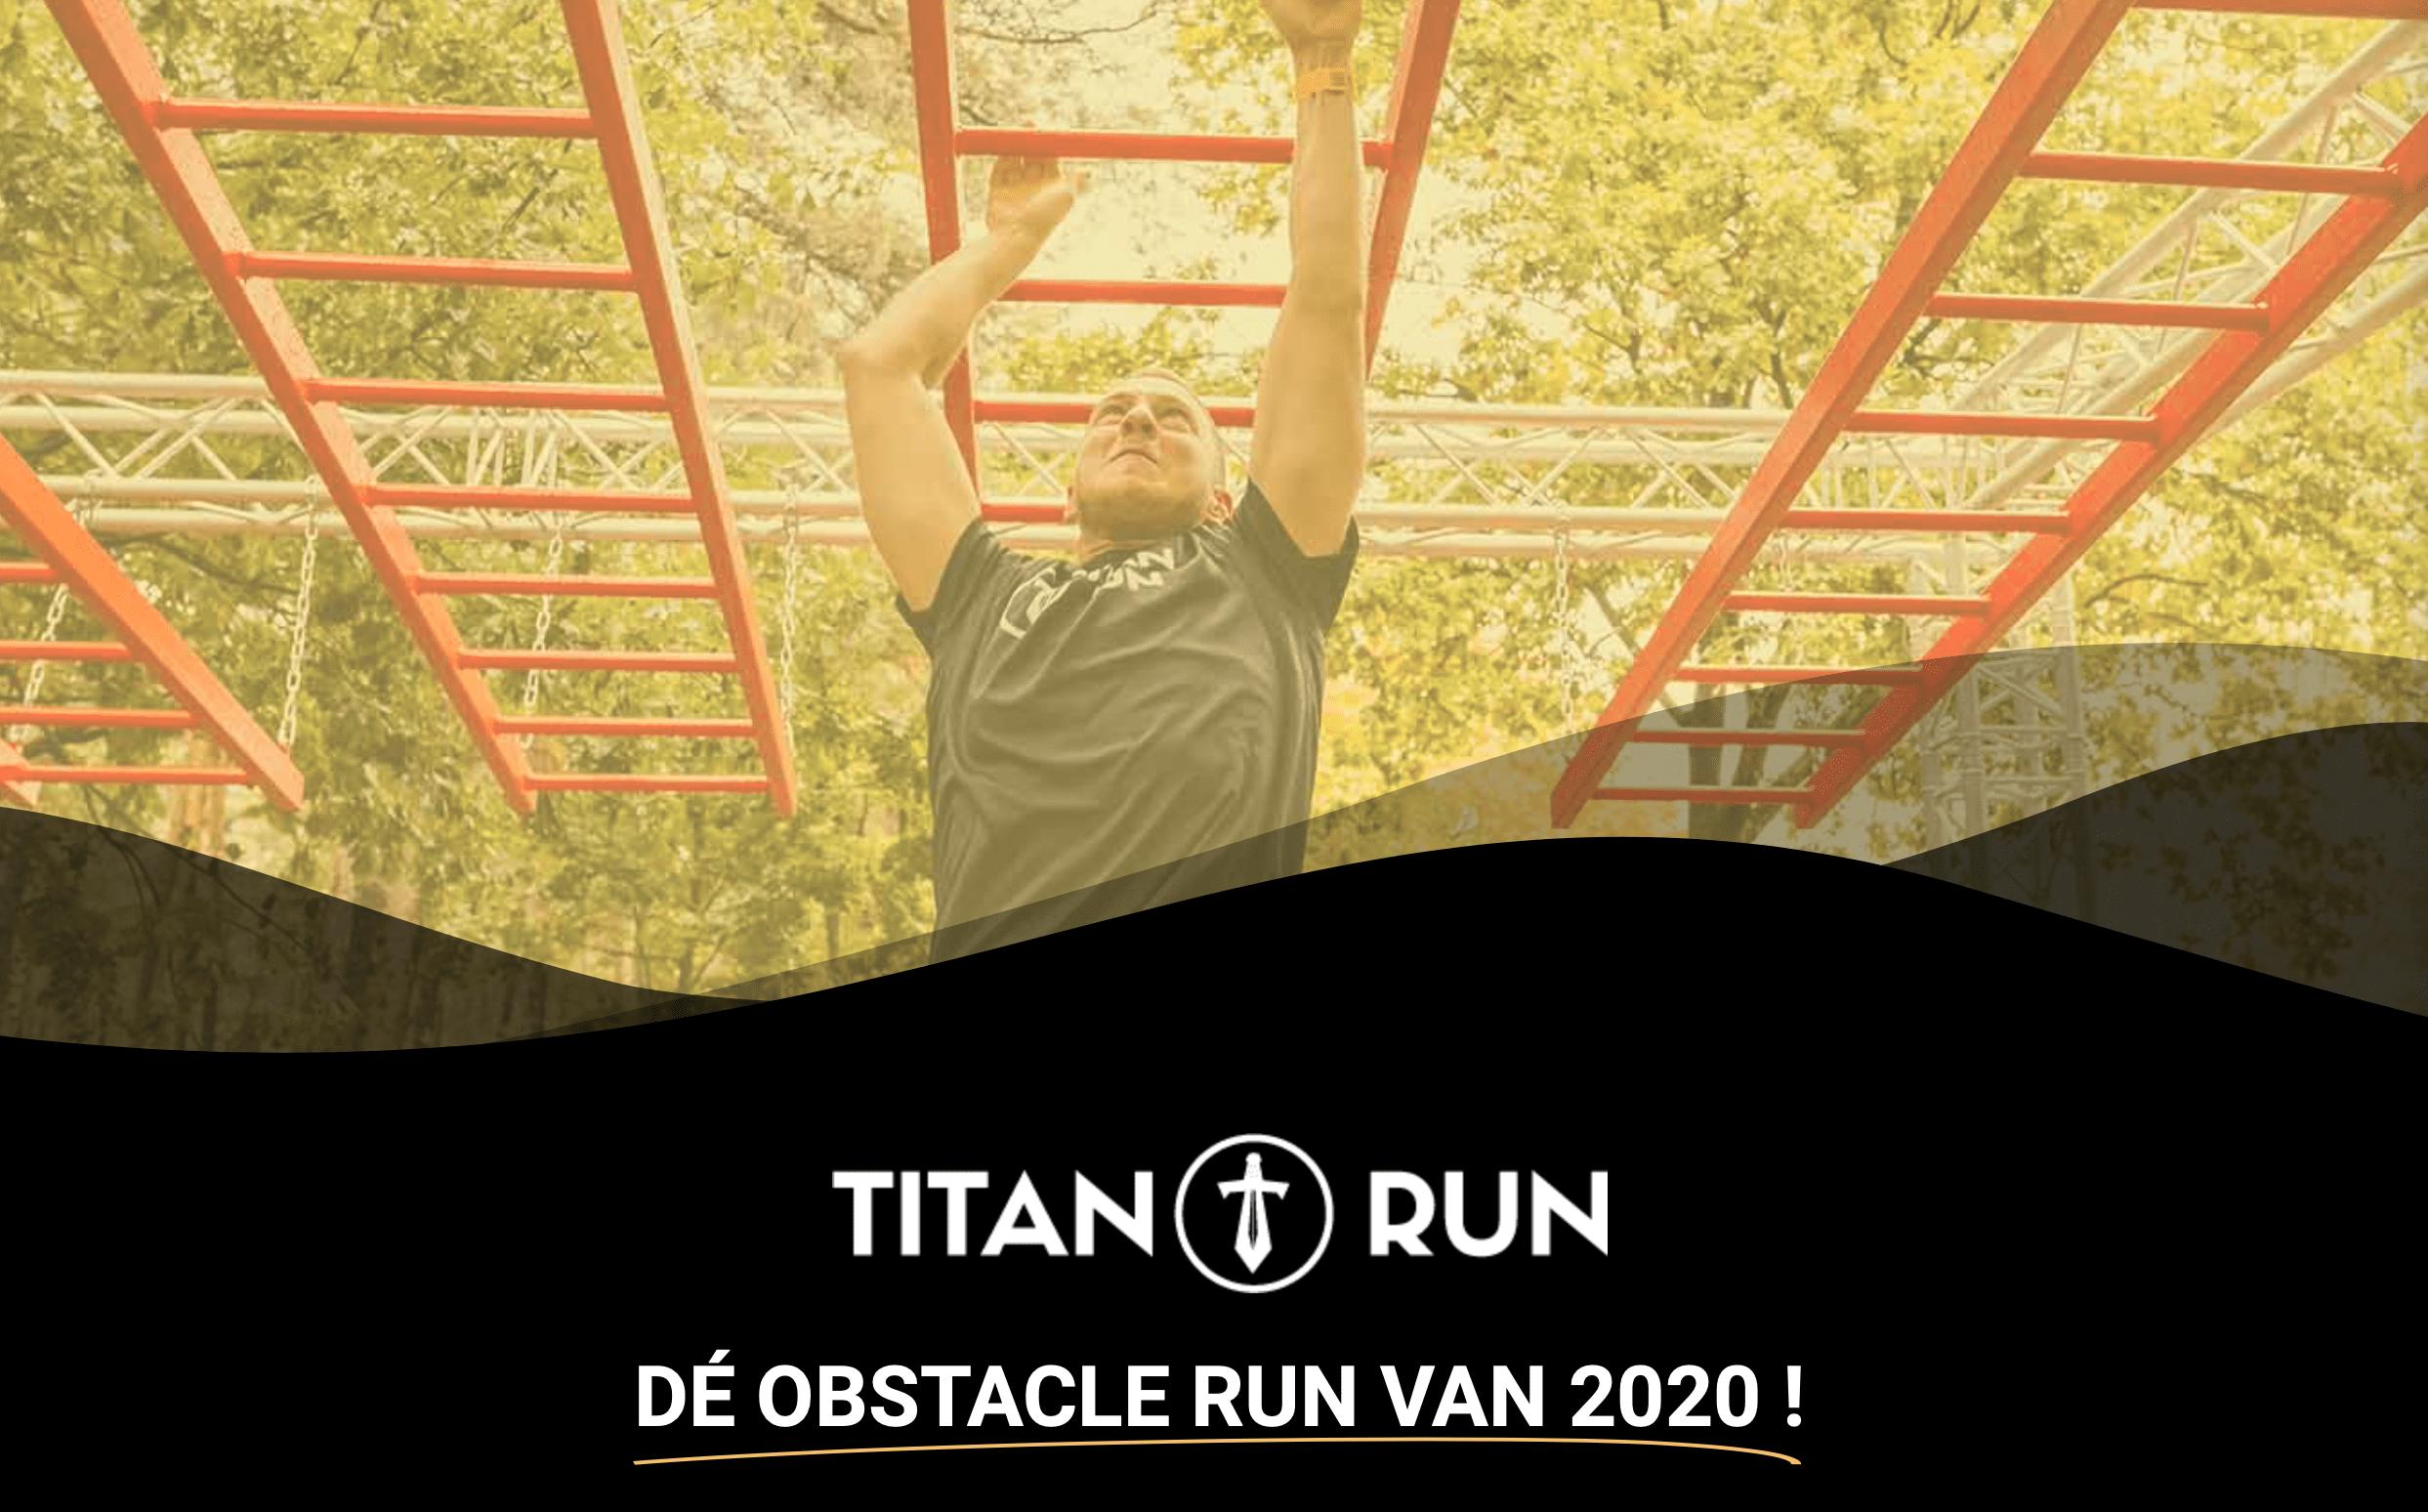 Titan Run